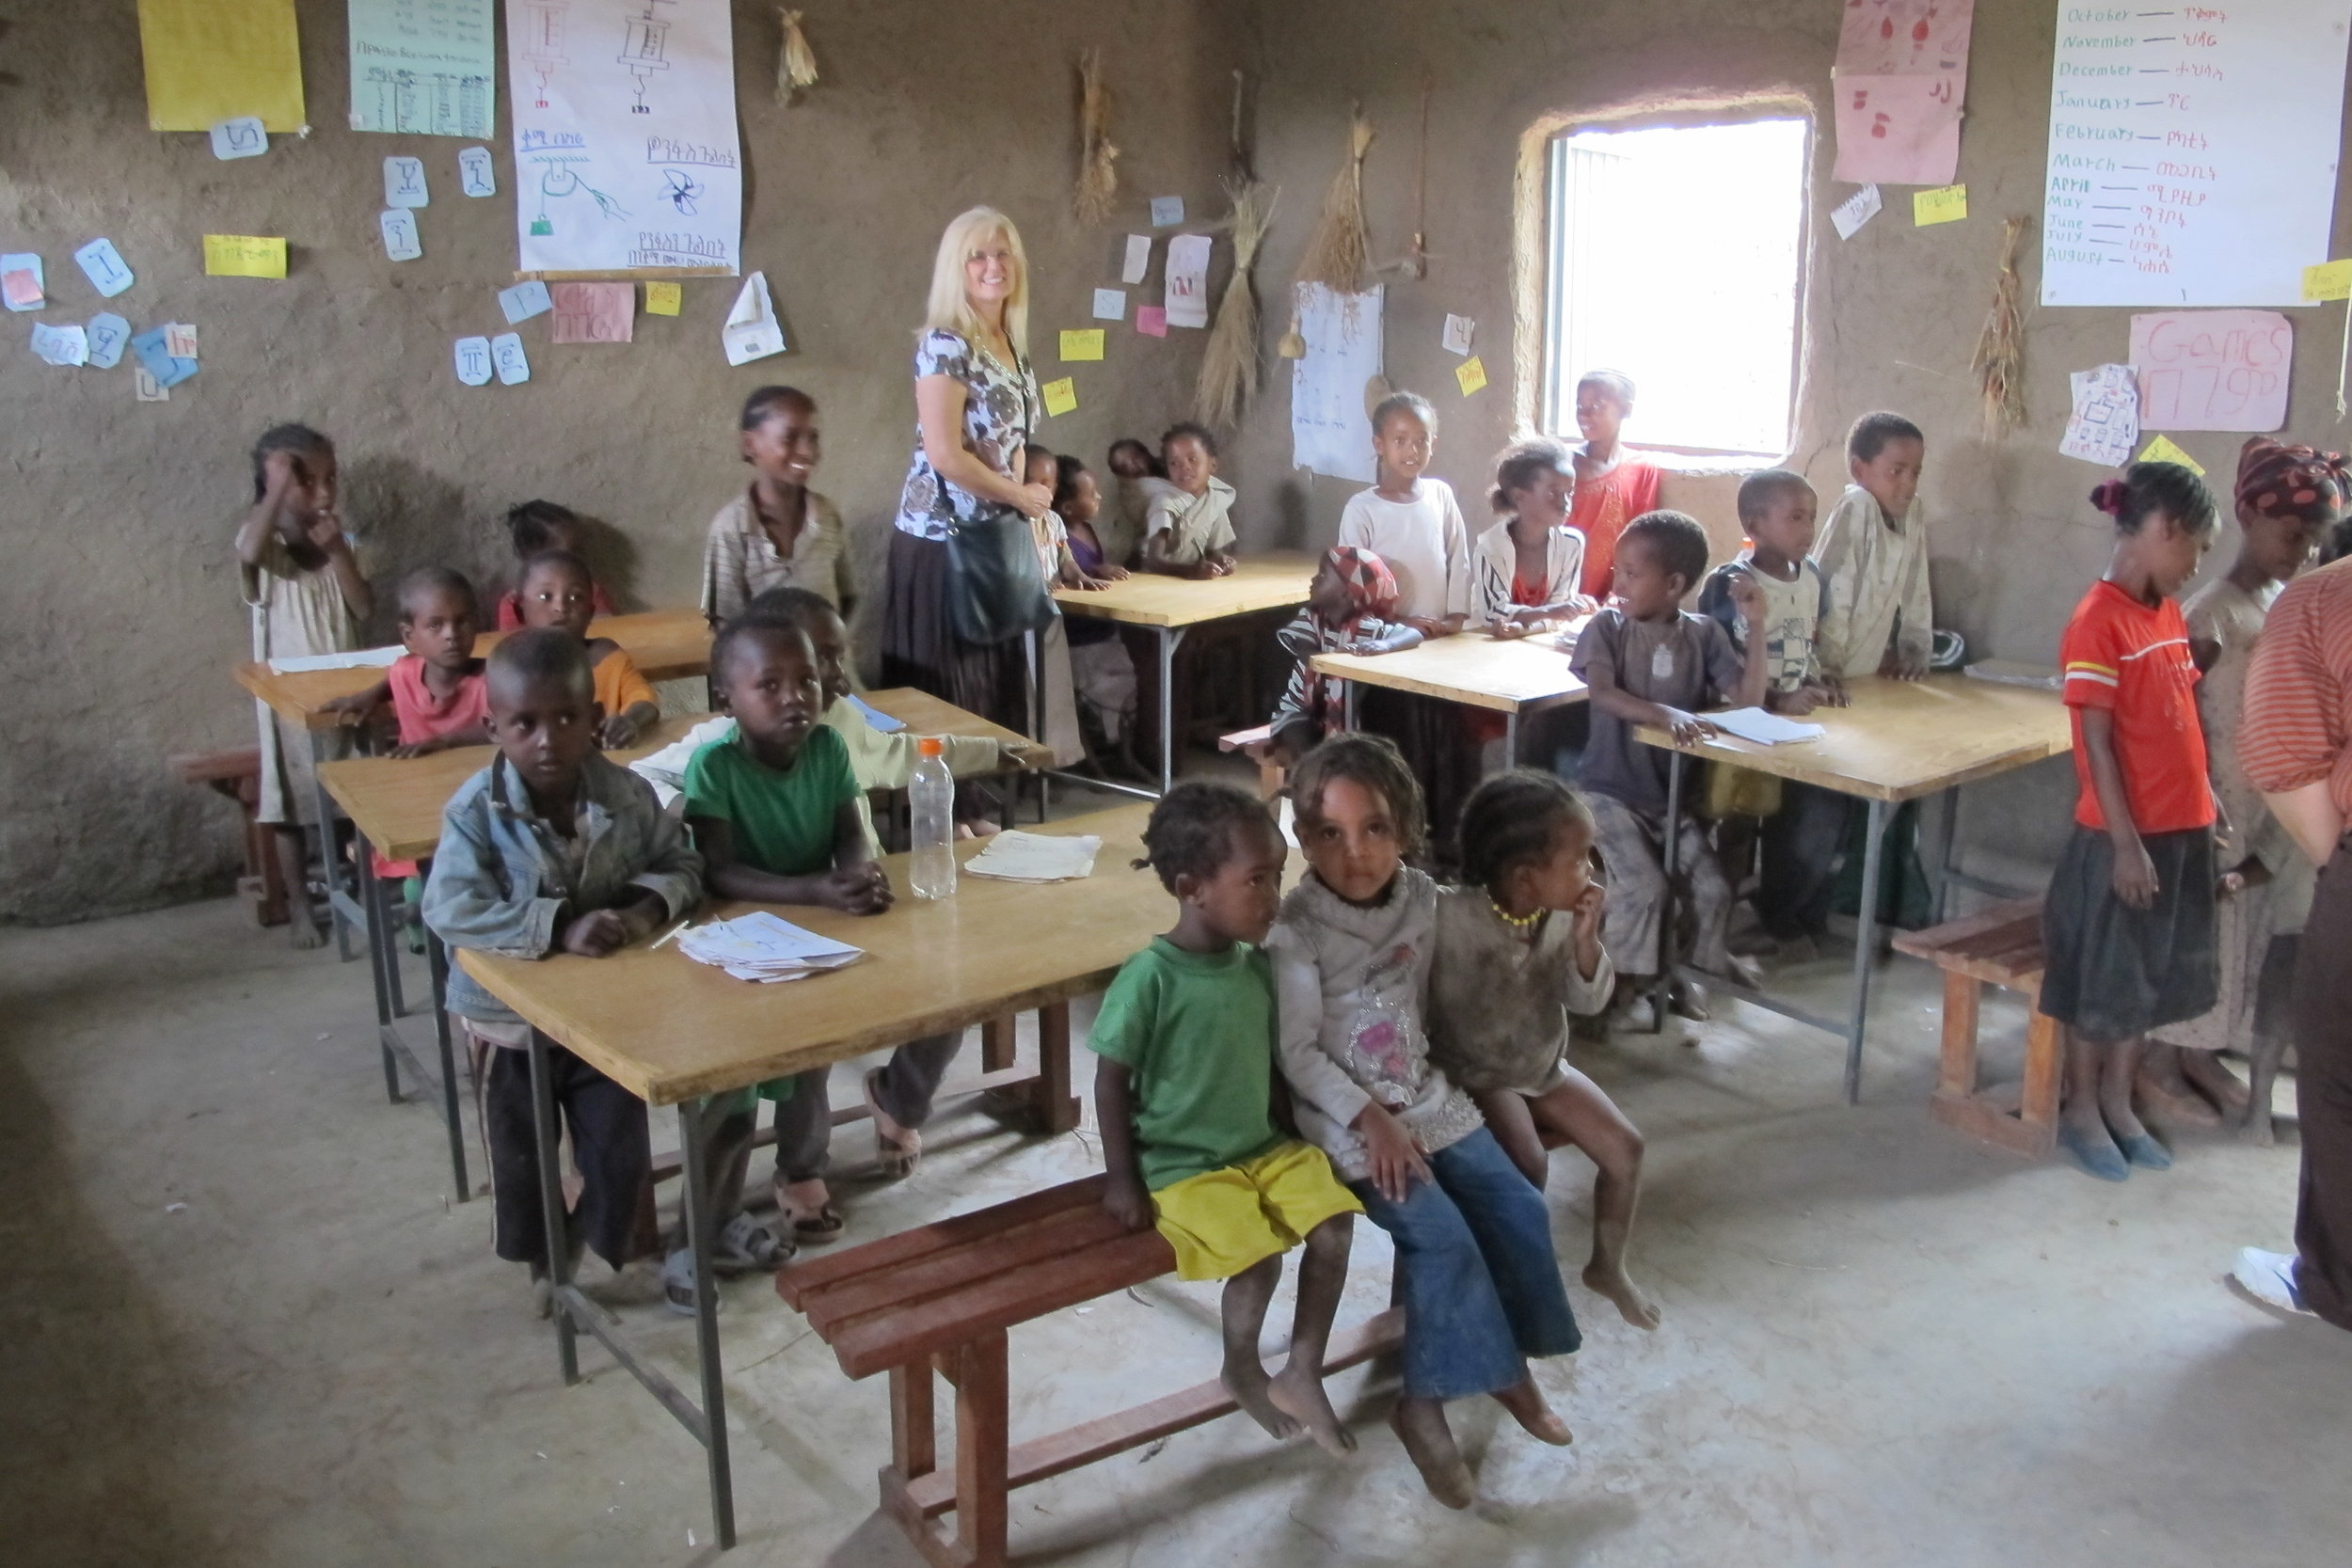 Karen Nalos in a school in Halaba, Ethiopia.